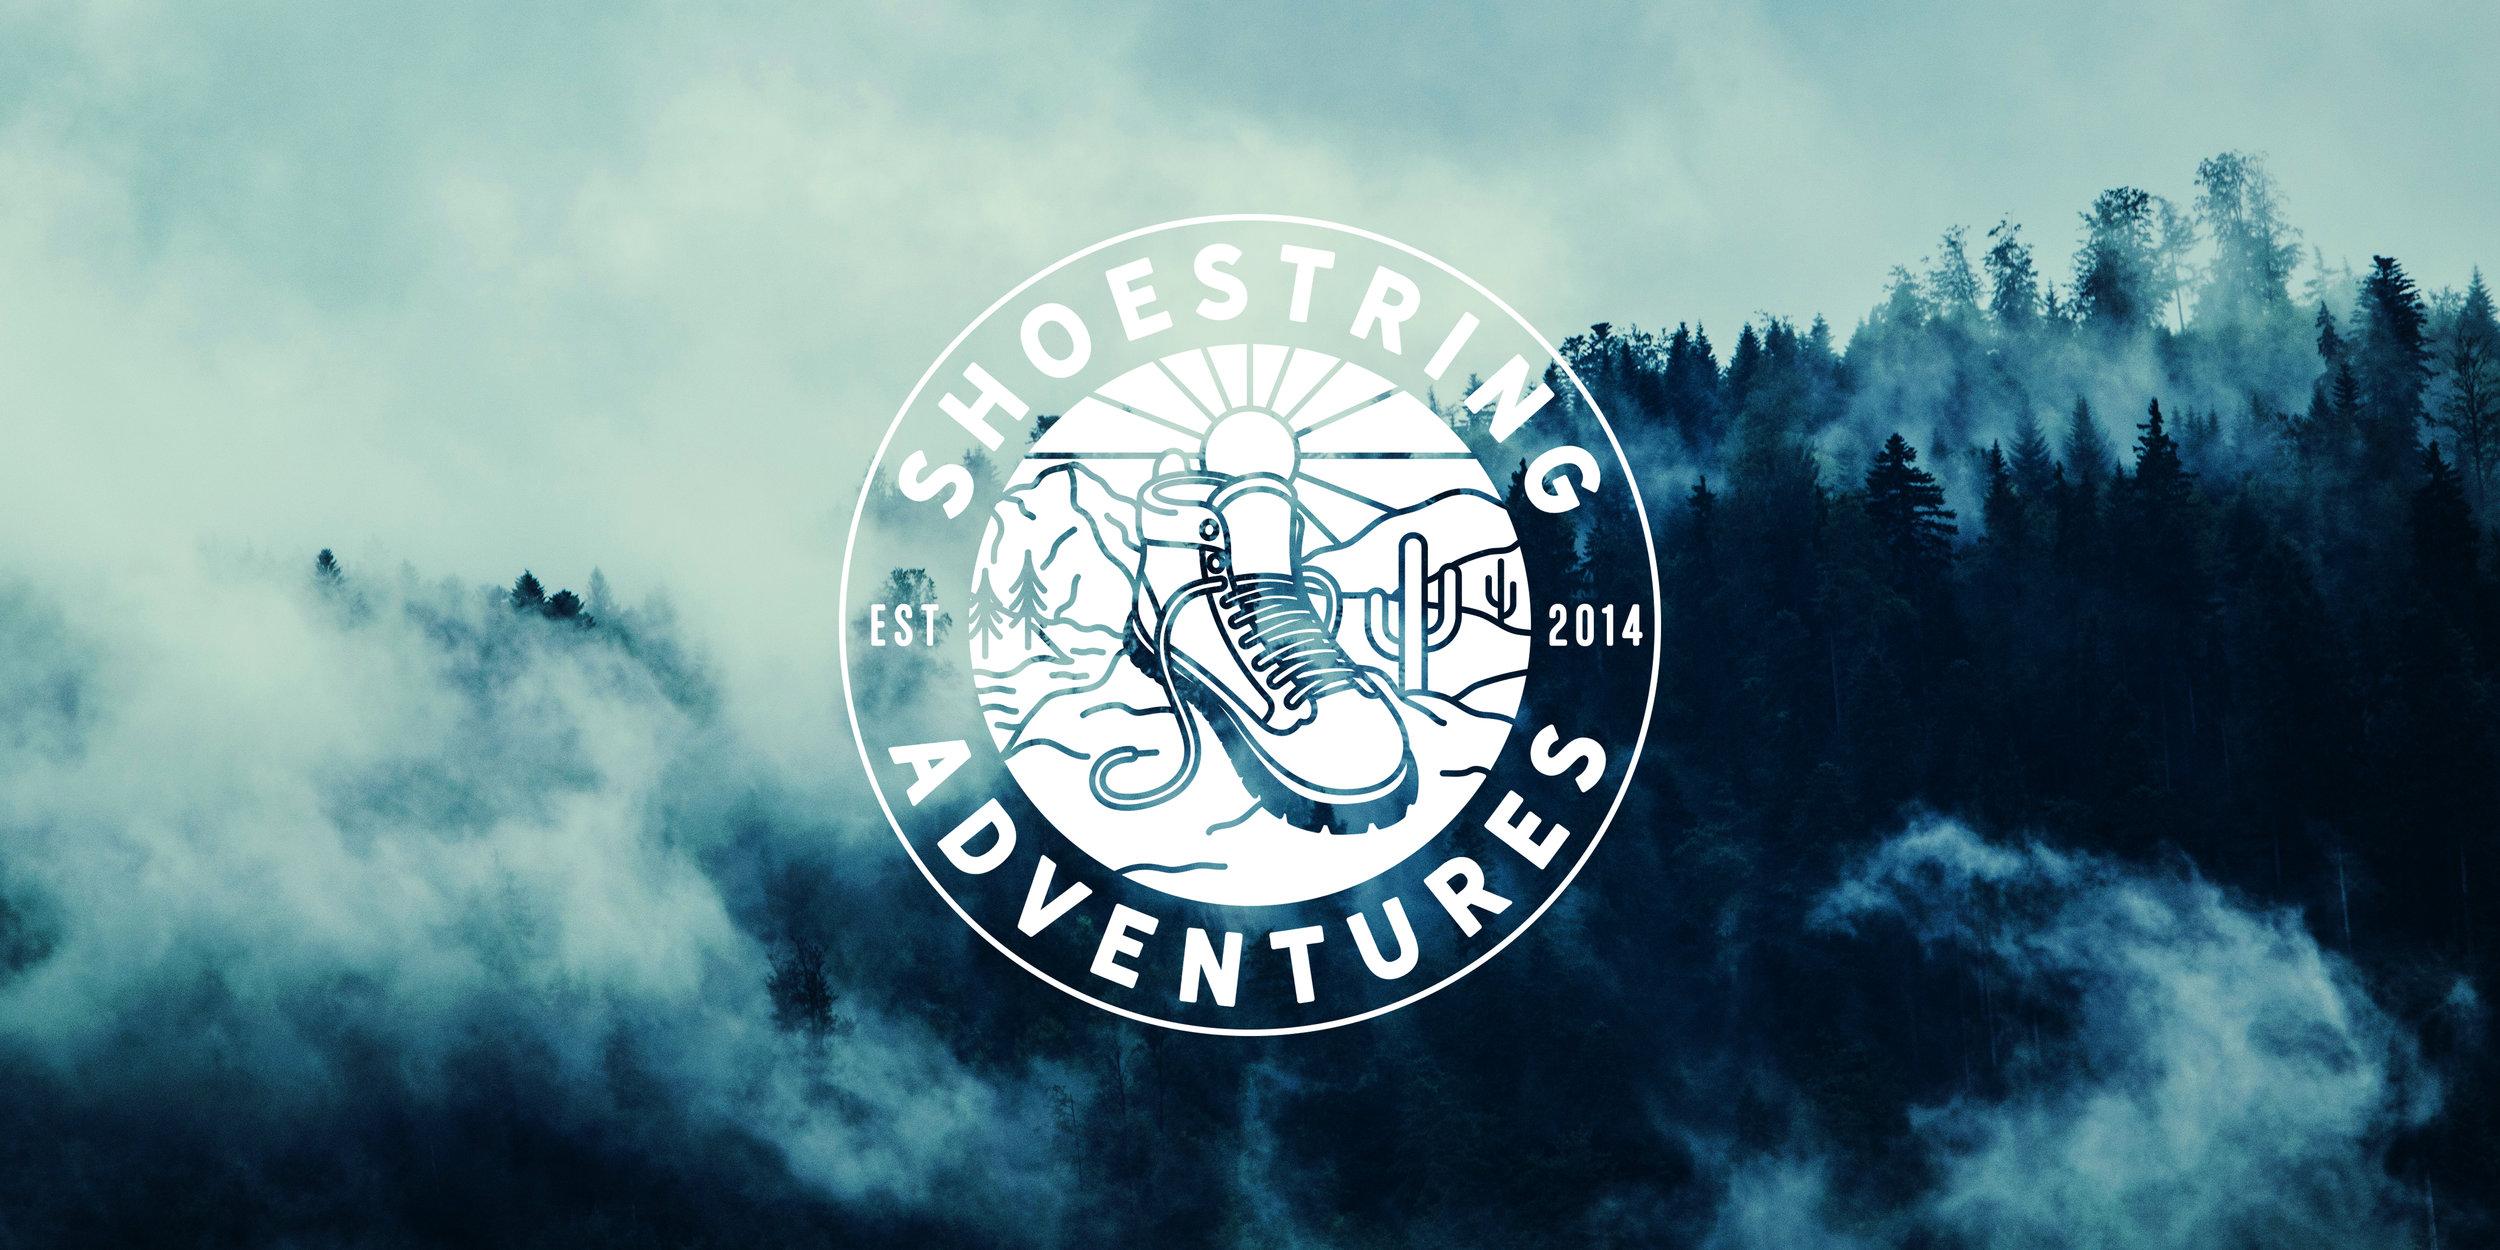 ShoestringAdventures-FogLogoOverlay-0529119.jpg